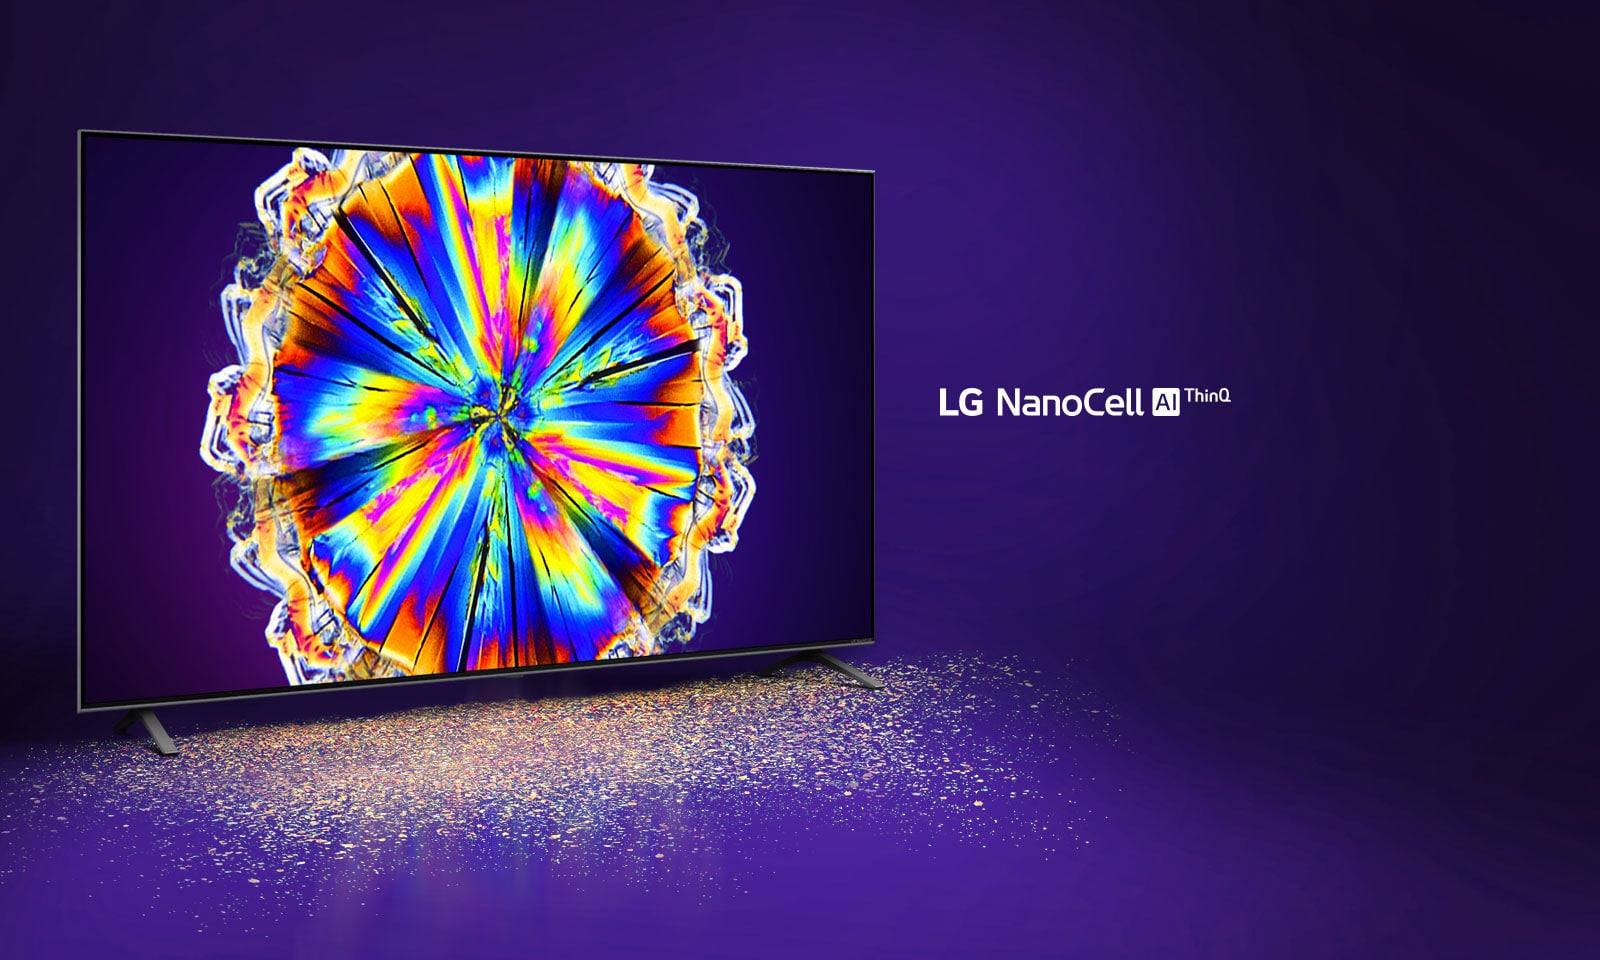 معرفی تکمیلی تلویزیون 65 اینچ ال جی مدل نانو 80